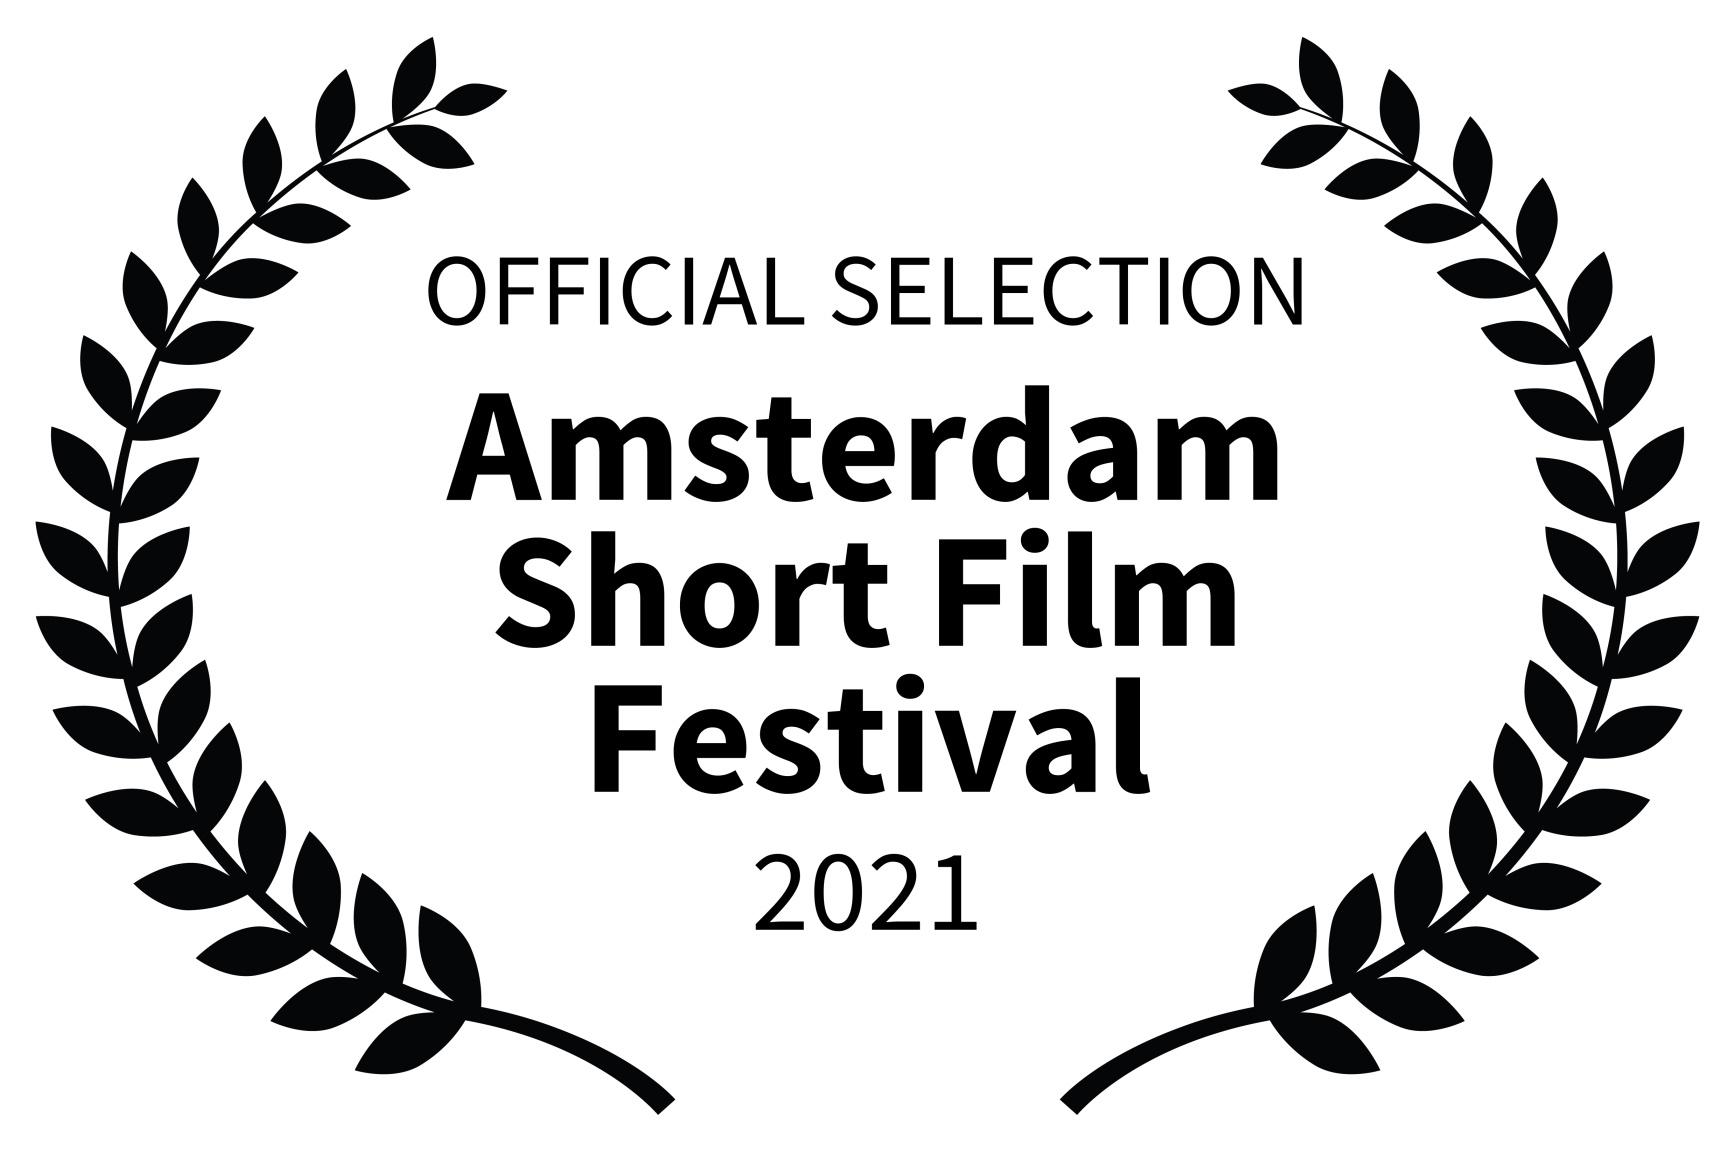 Official Selection, Amsterdam Short Film Festival